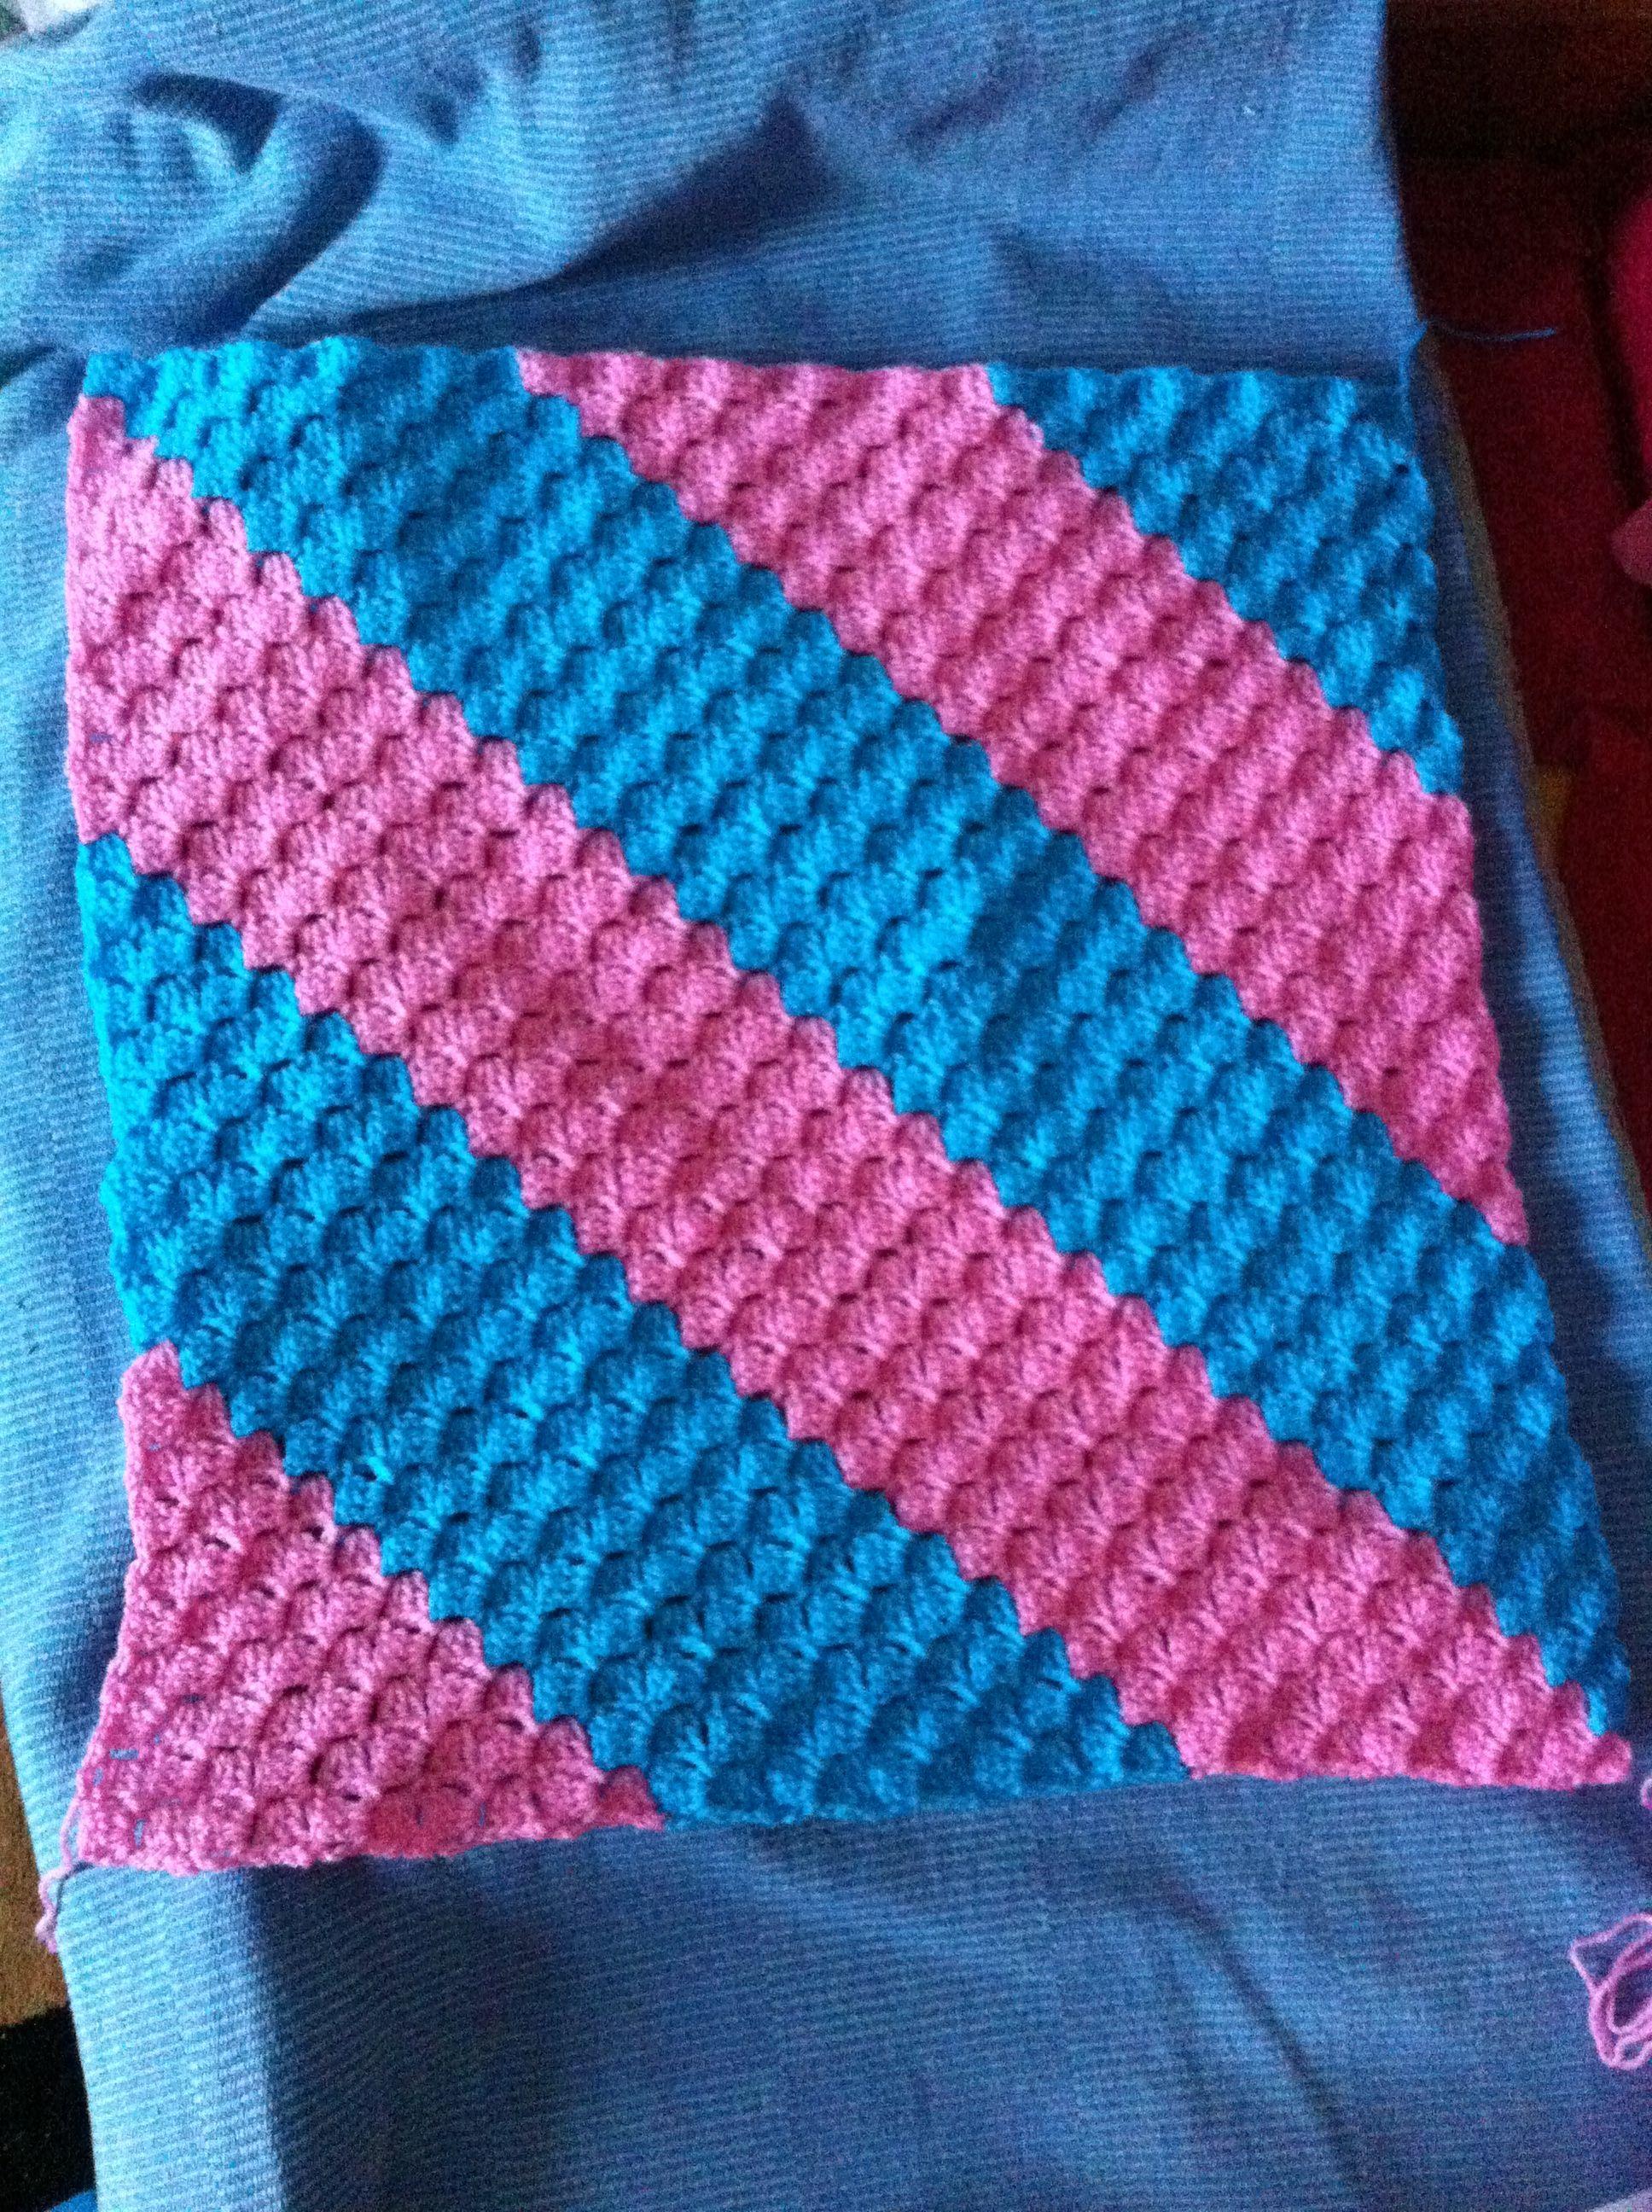 Crocheting C2c : C2C blanket Crochet Projects Pinterest